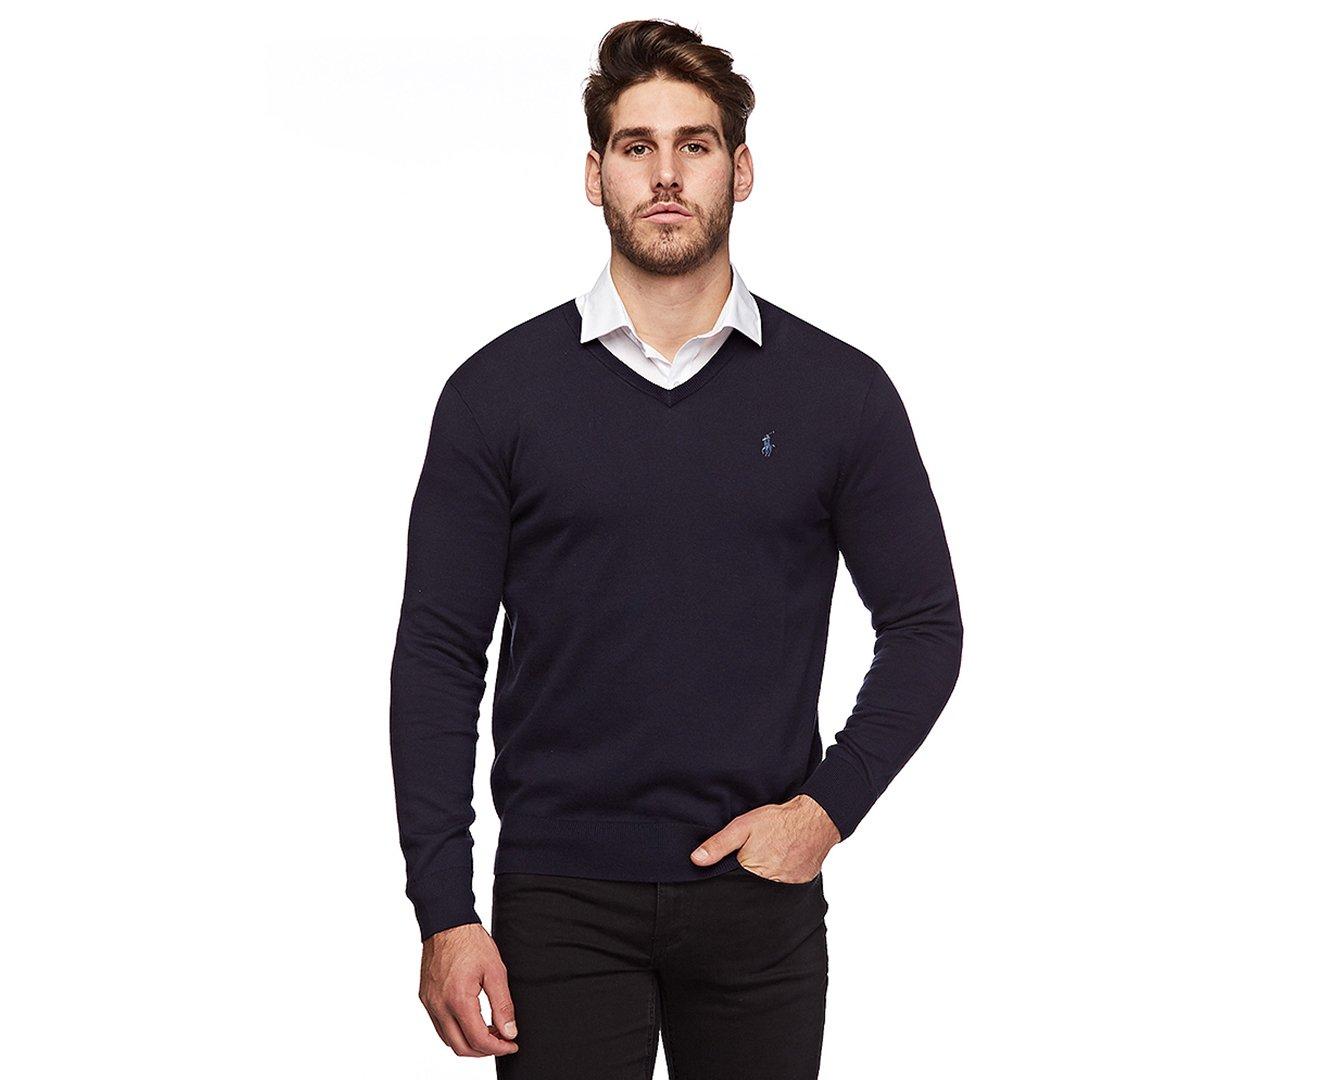 Polo Ralph Lauren Mens Pima Cotton V-Neck Sweater (Navybluepny , M)